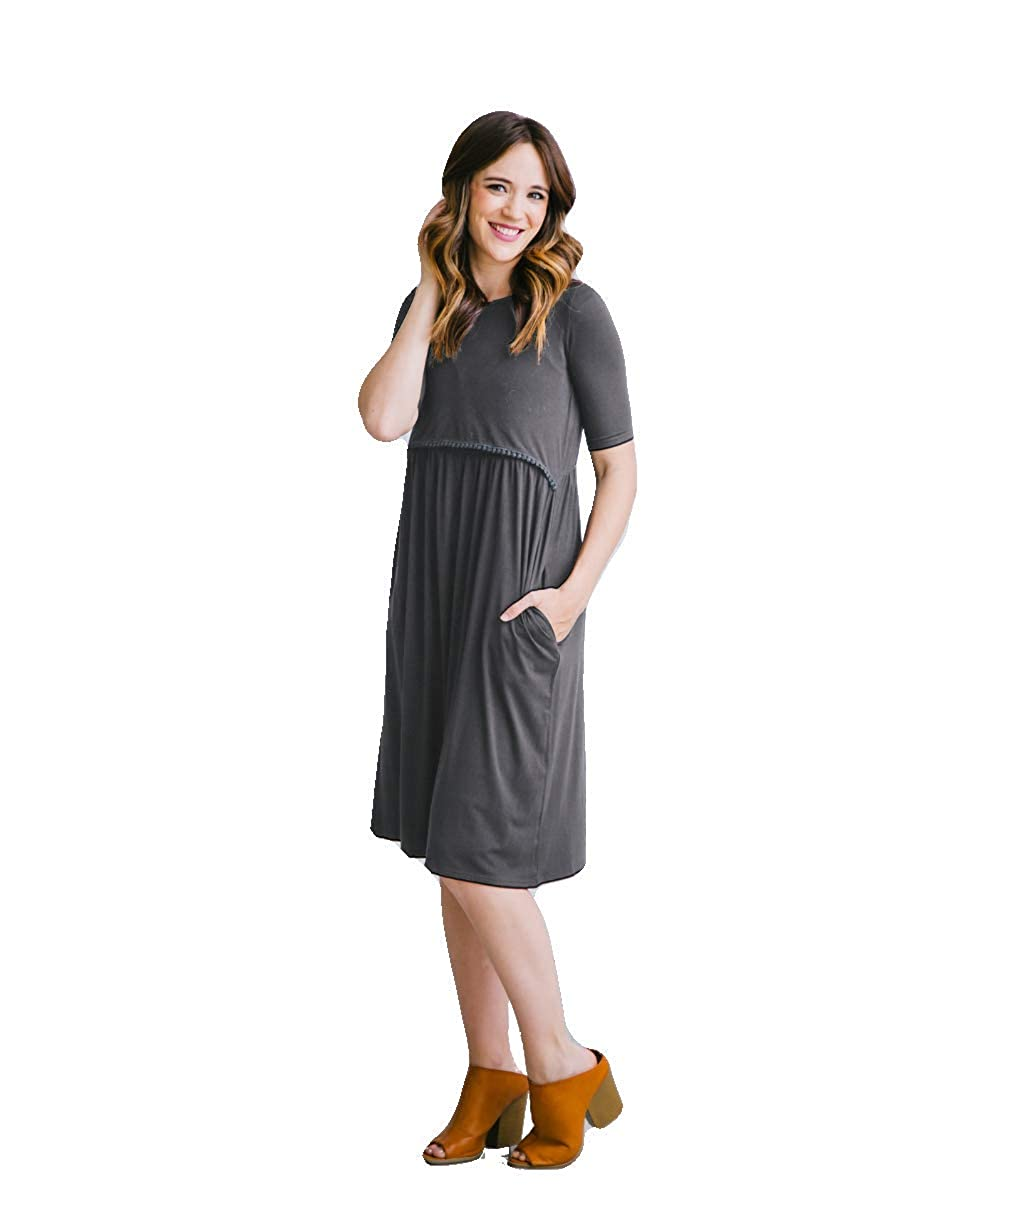 Undercover Mama DRESS レディース B07DHW7WRR Medium|グレー グレー Medium